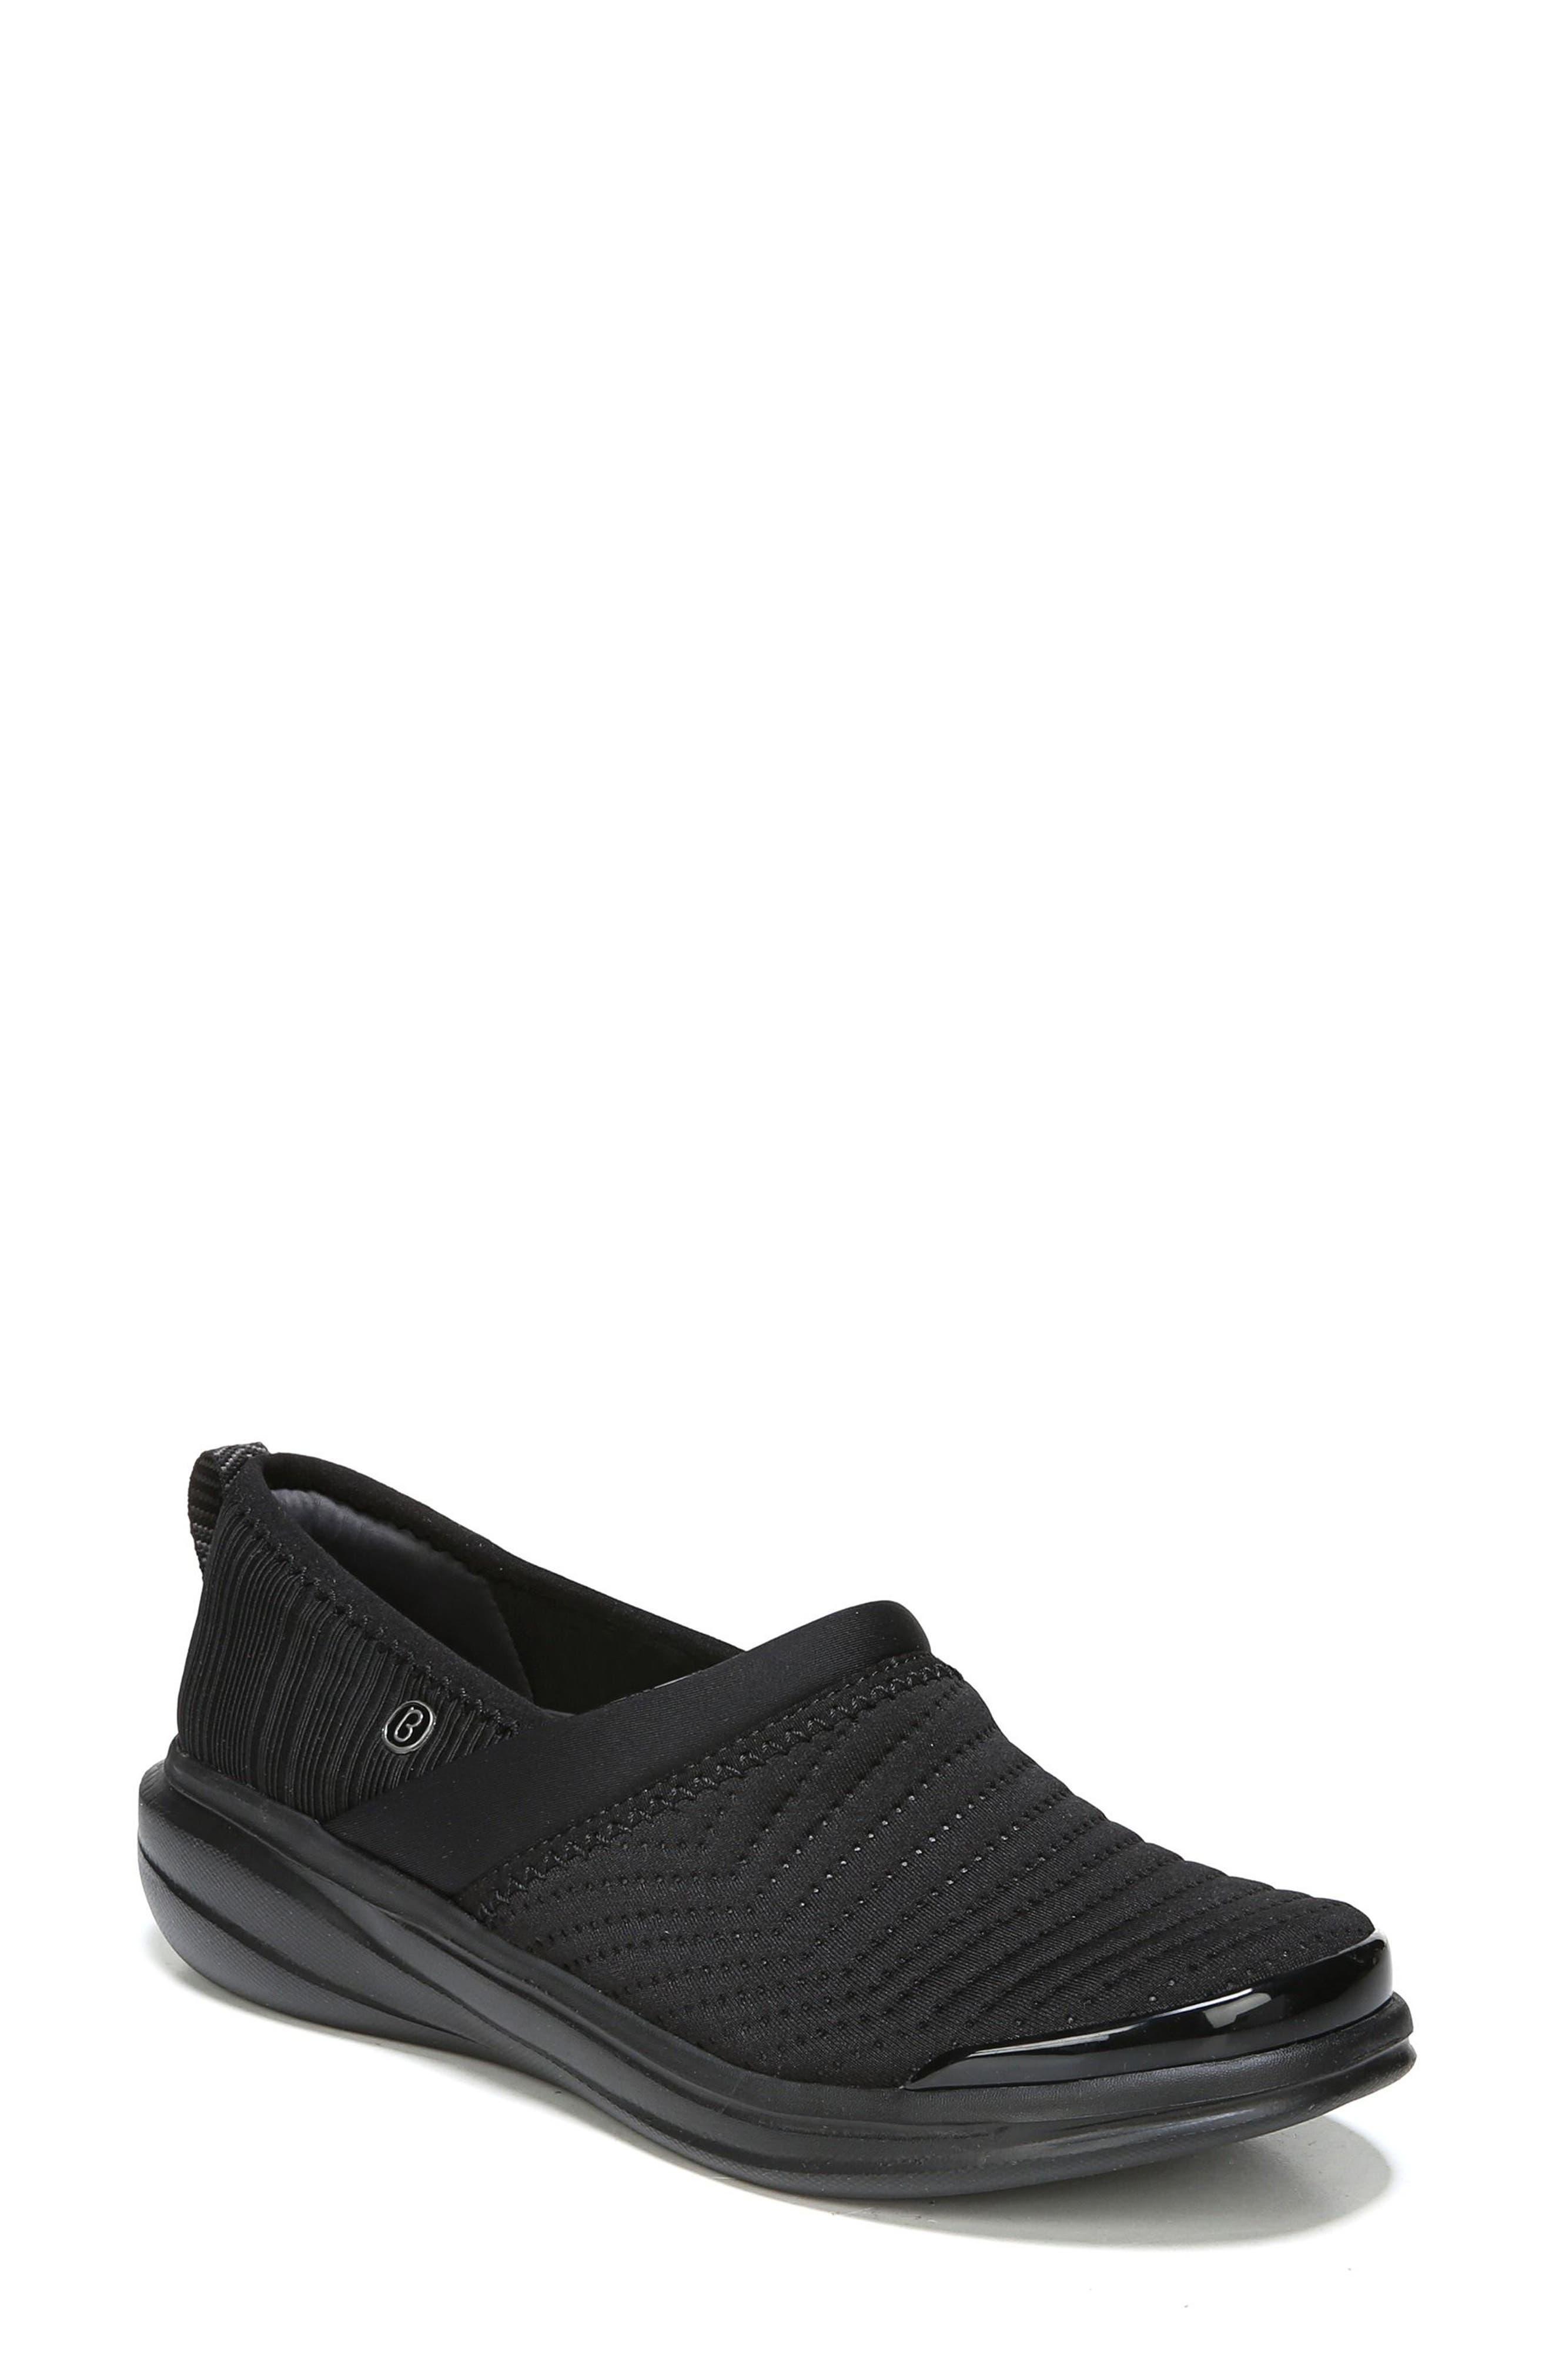 Coco Slip-On Sneaker,                             Main thumbnail 1, color,                             BLACK FABRIC